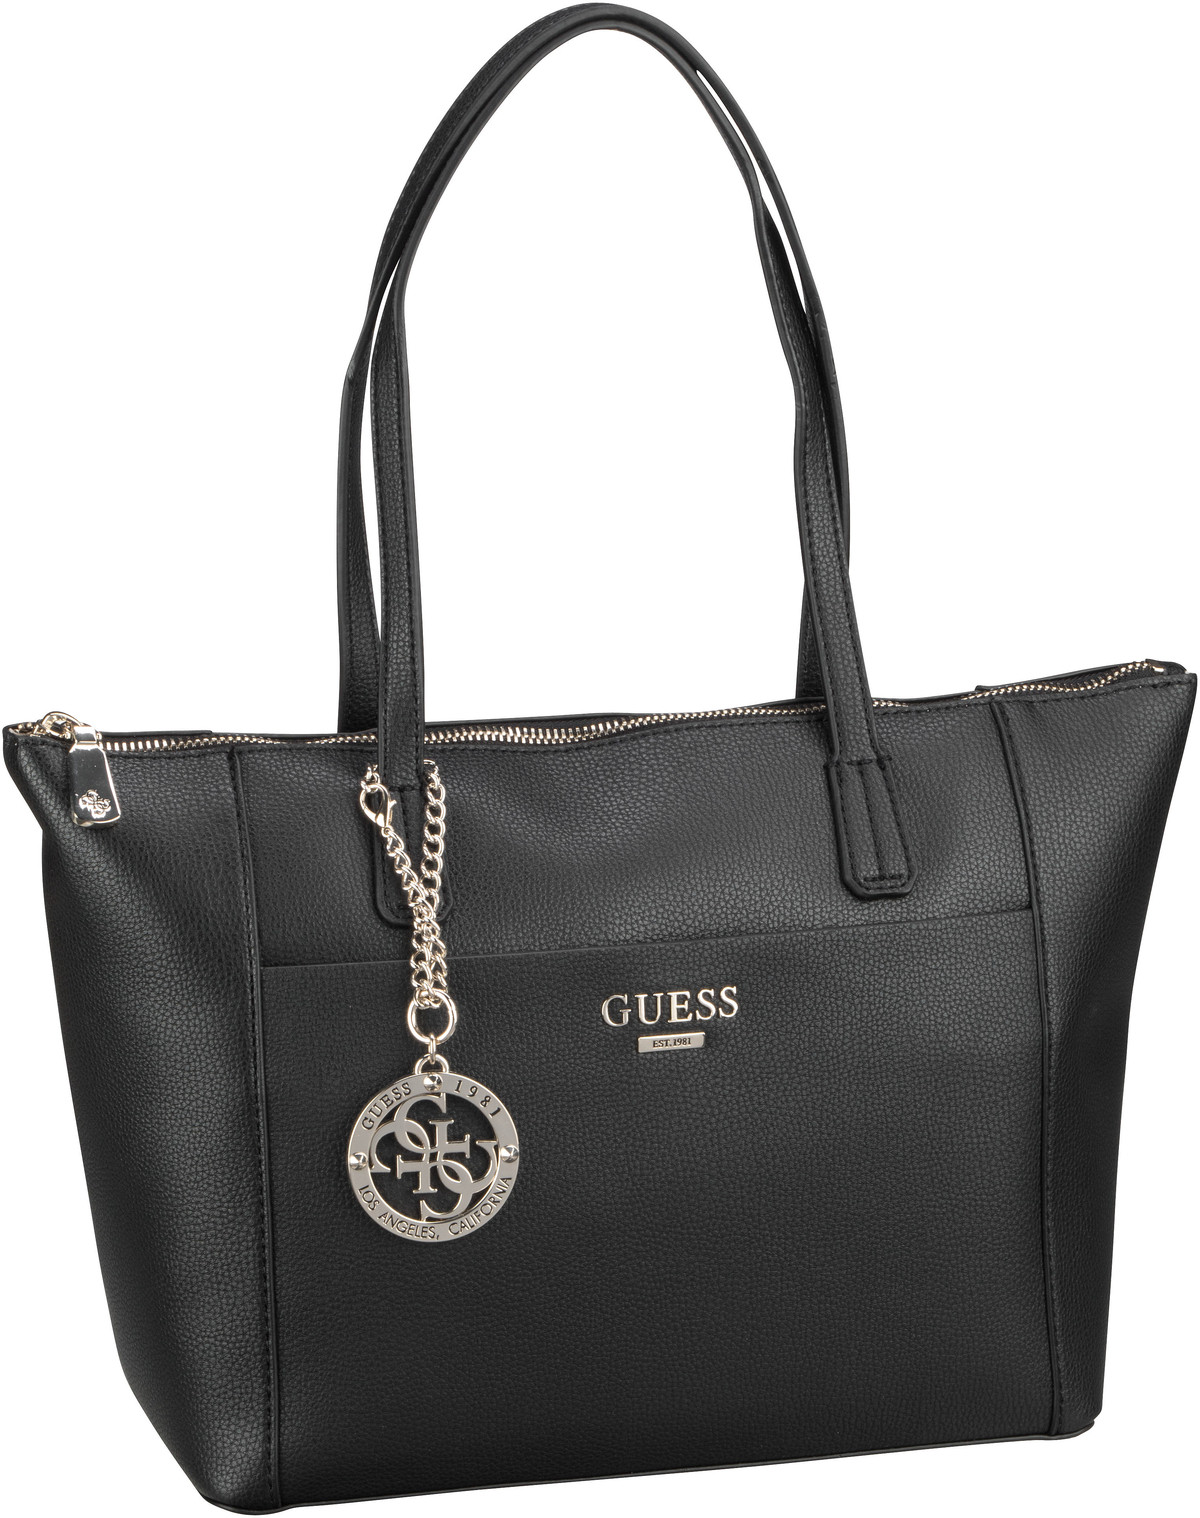 Handtasche Alma Tote Black